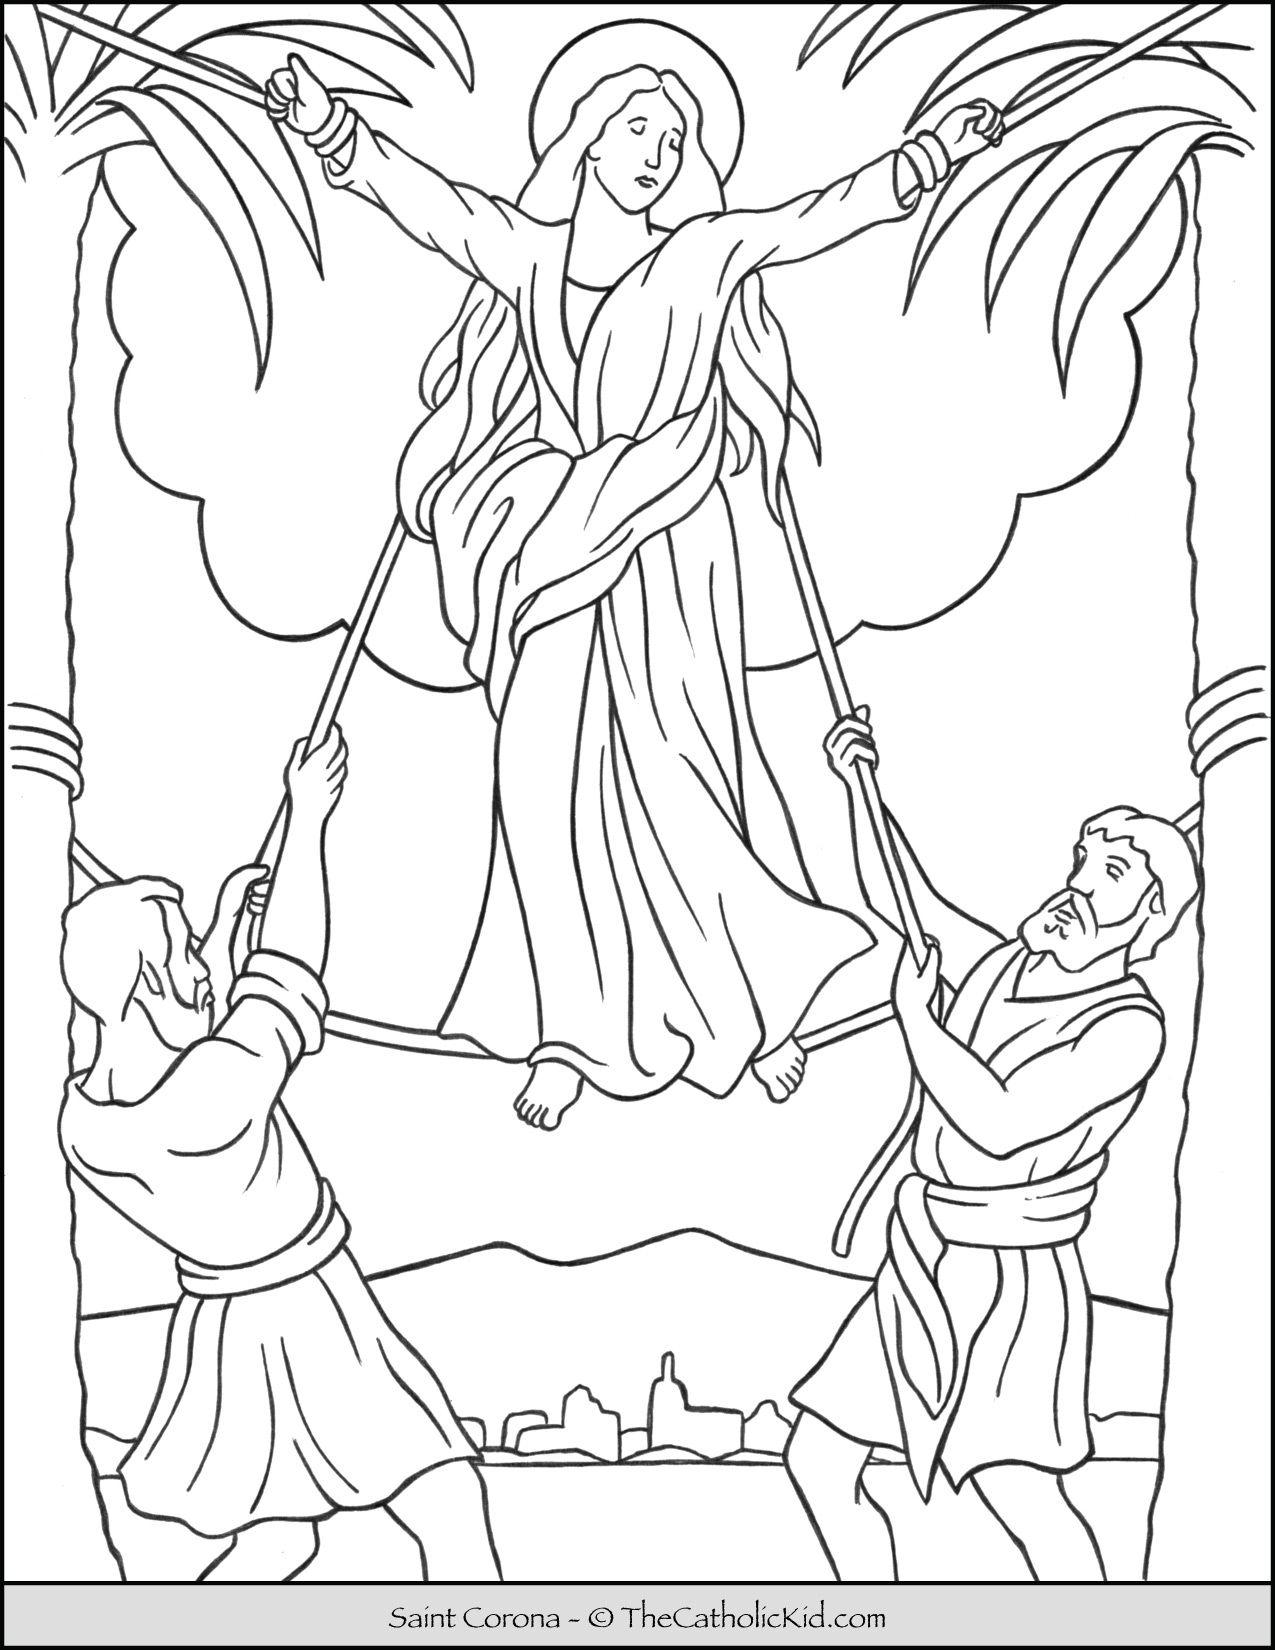 Saint Corona Coloring Page Thecatholickid Com Catholic Coloring Coloring Pages Saint Coloring